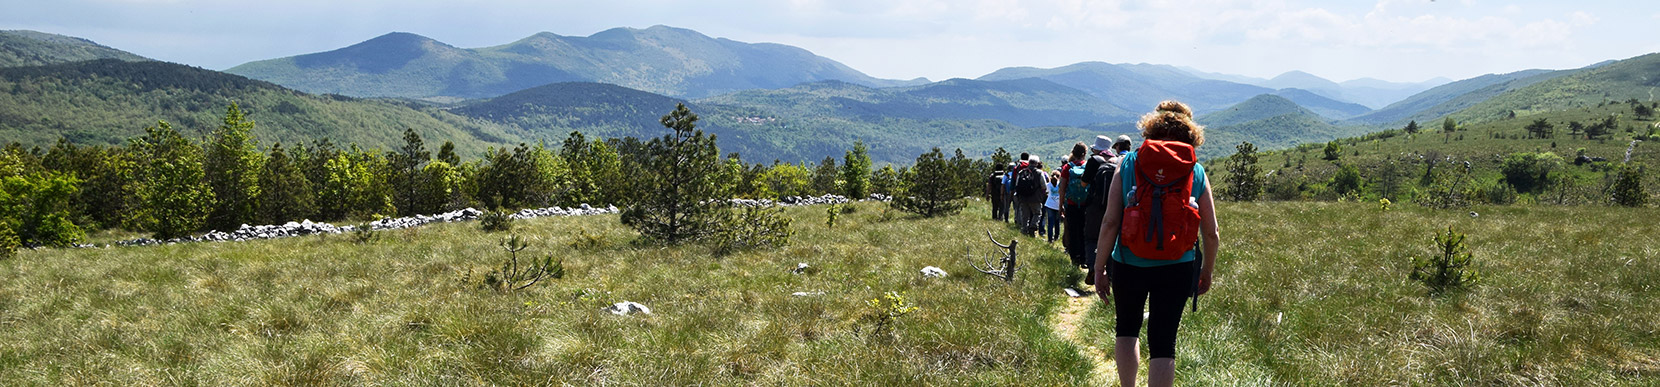 Gruppo Tutela Ambiente Montano - TAM